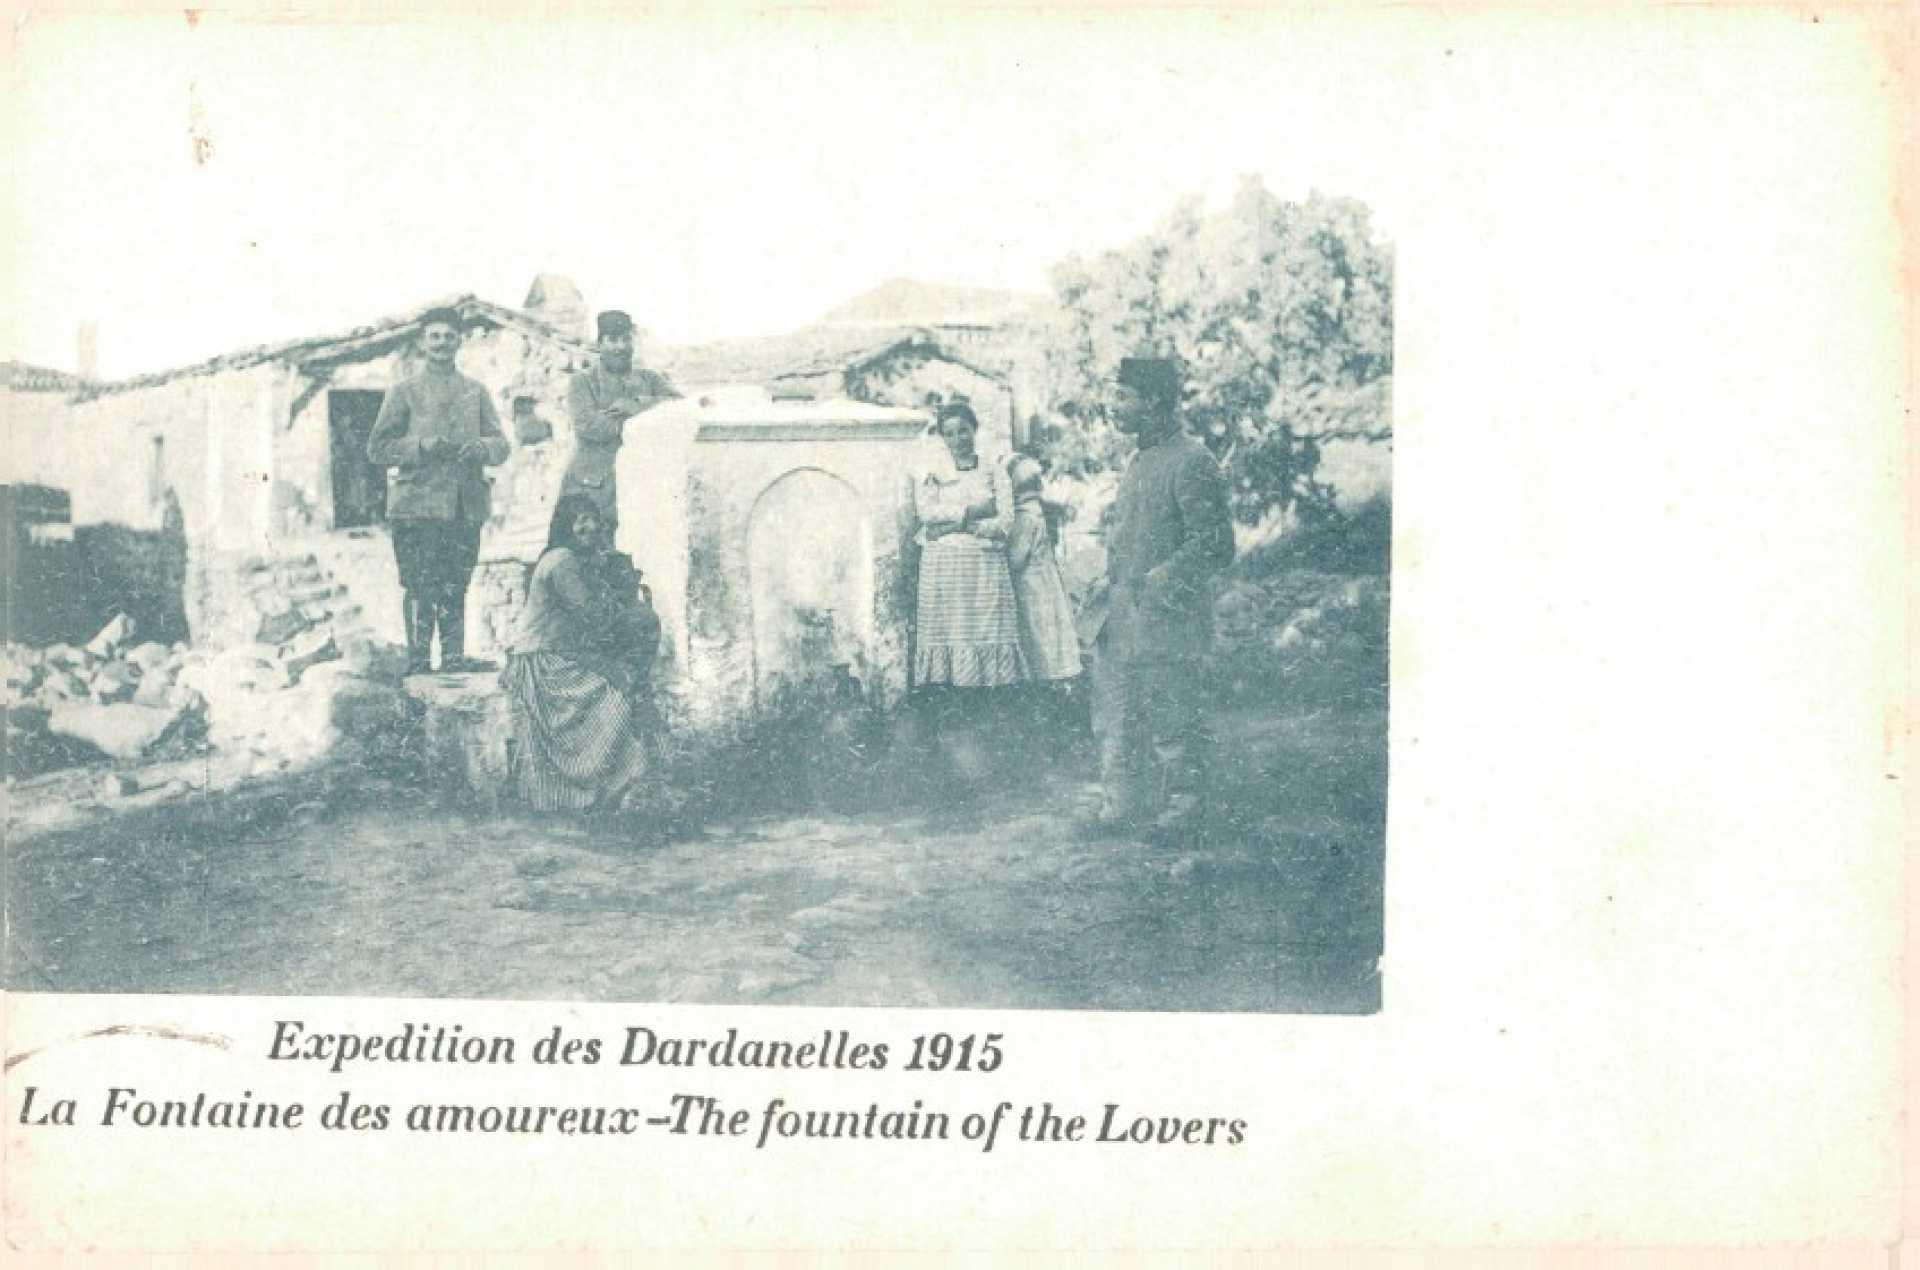 Expedition des Dardanelles 1915